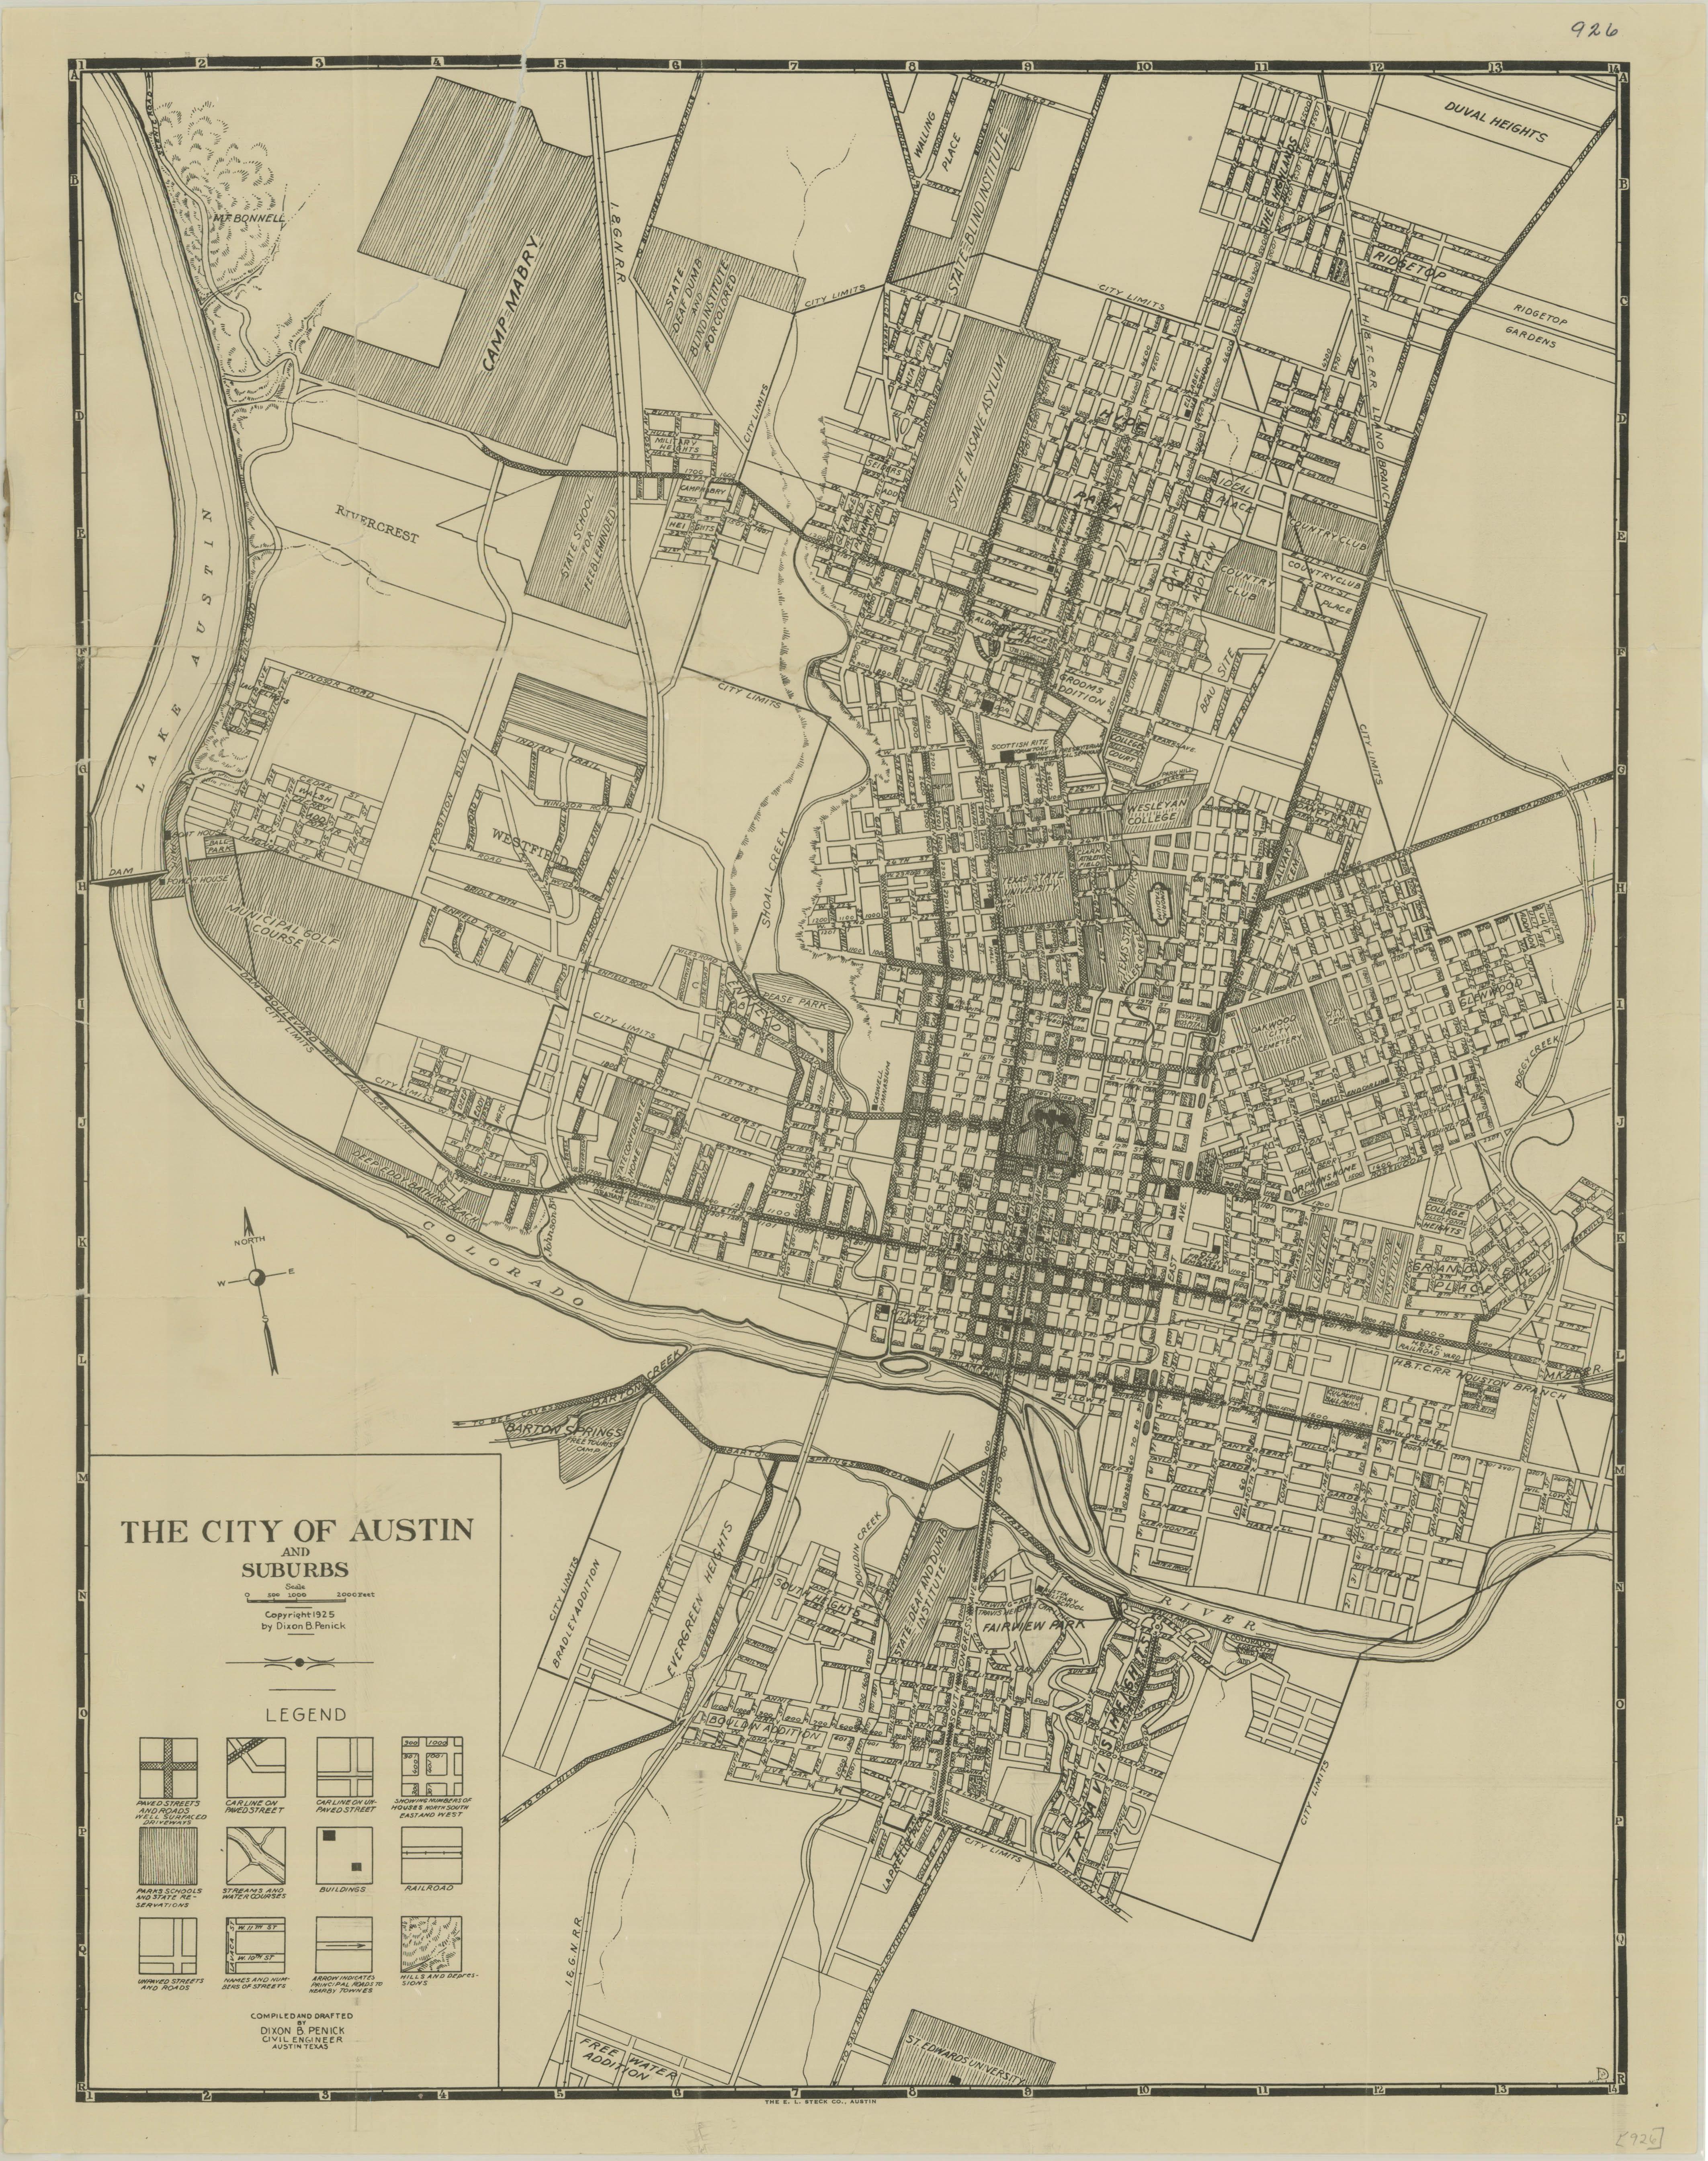 Historical Maps of Austin « Bryker Woods Neighborhood